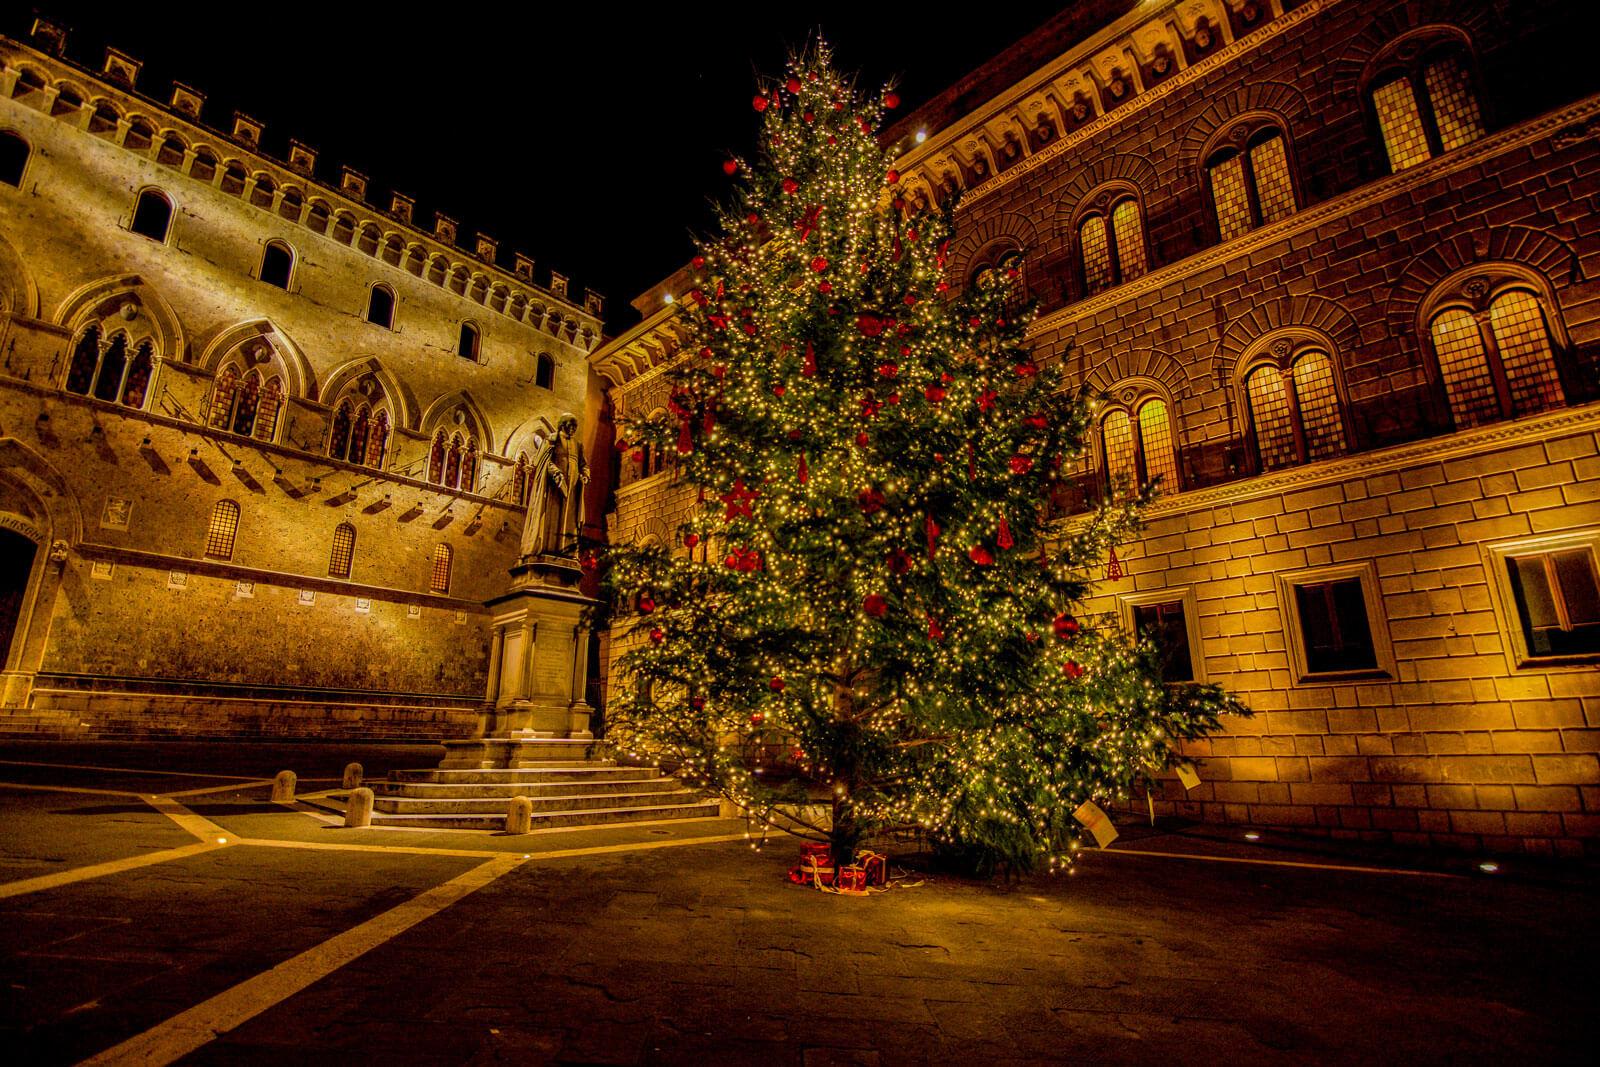 2021/01/Advent-Toskana.jpg